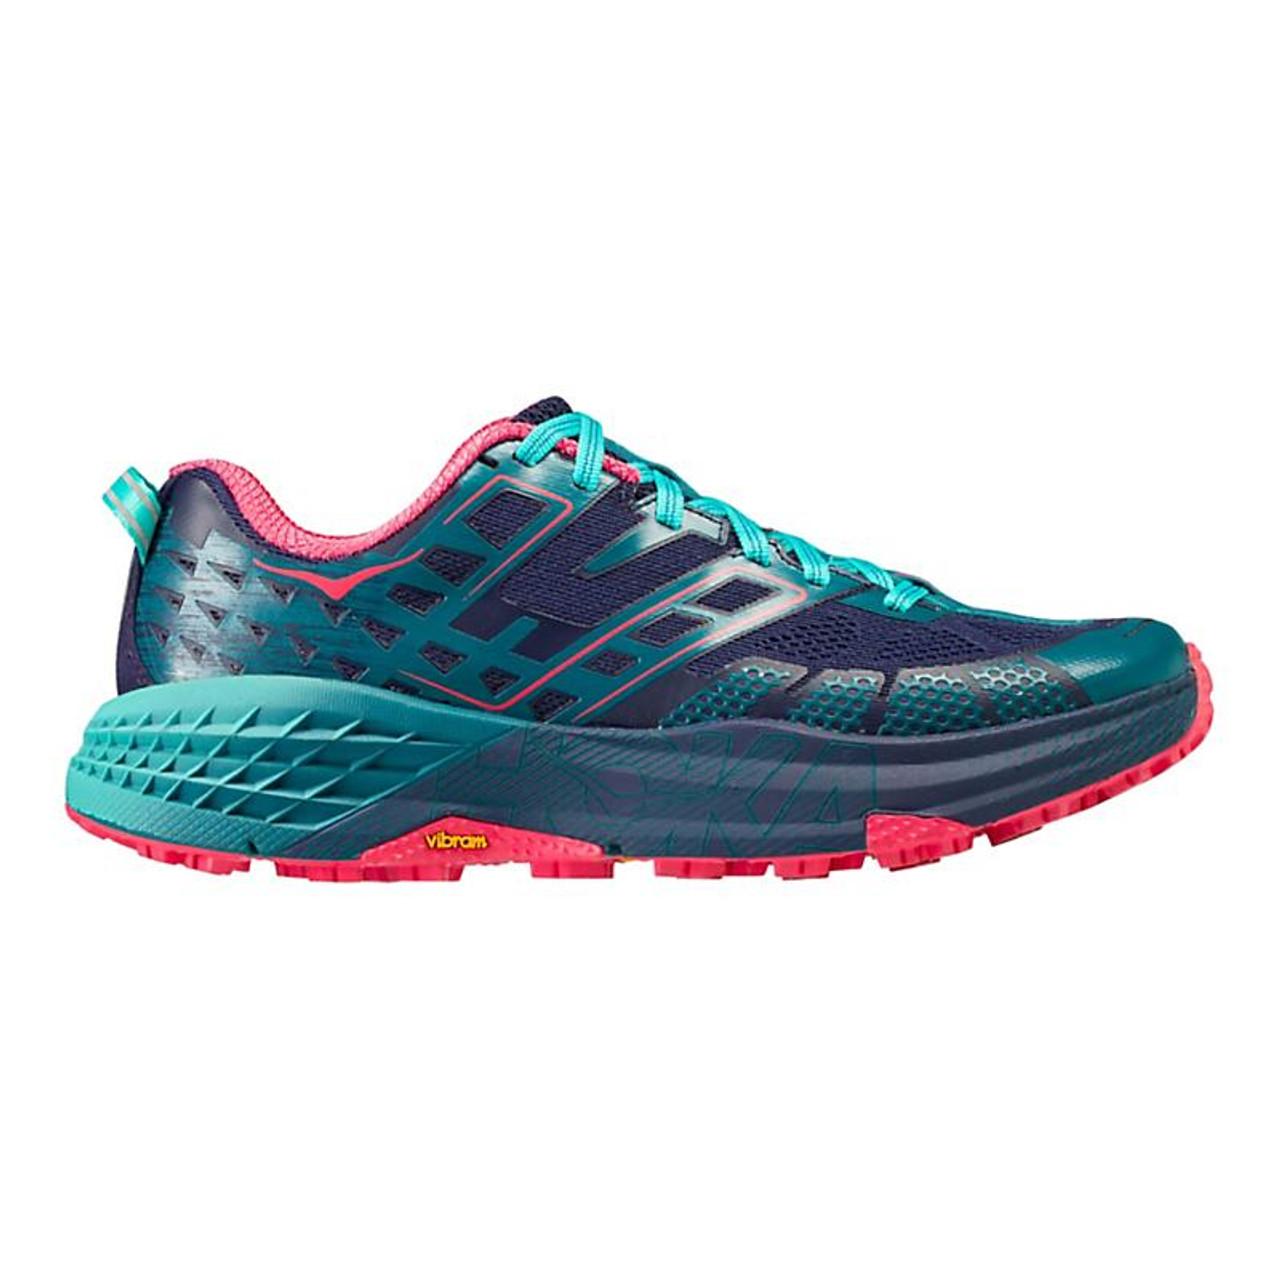 One Speedgoat 2 Trail Running Shoe